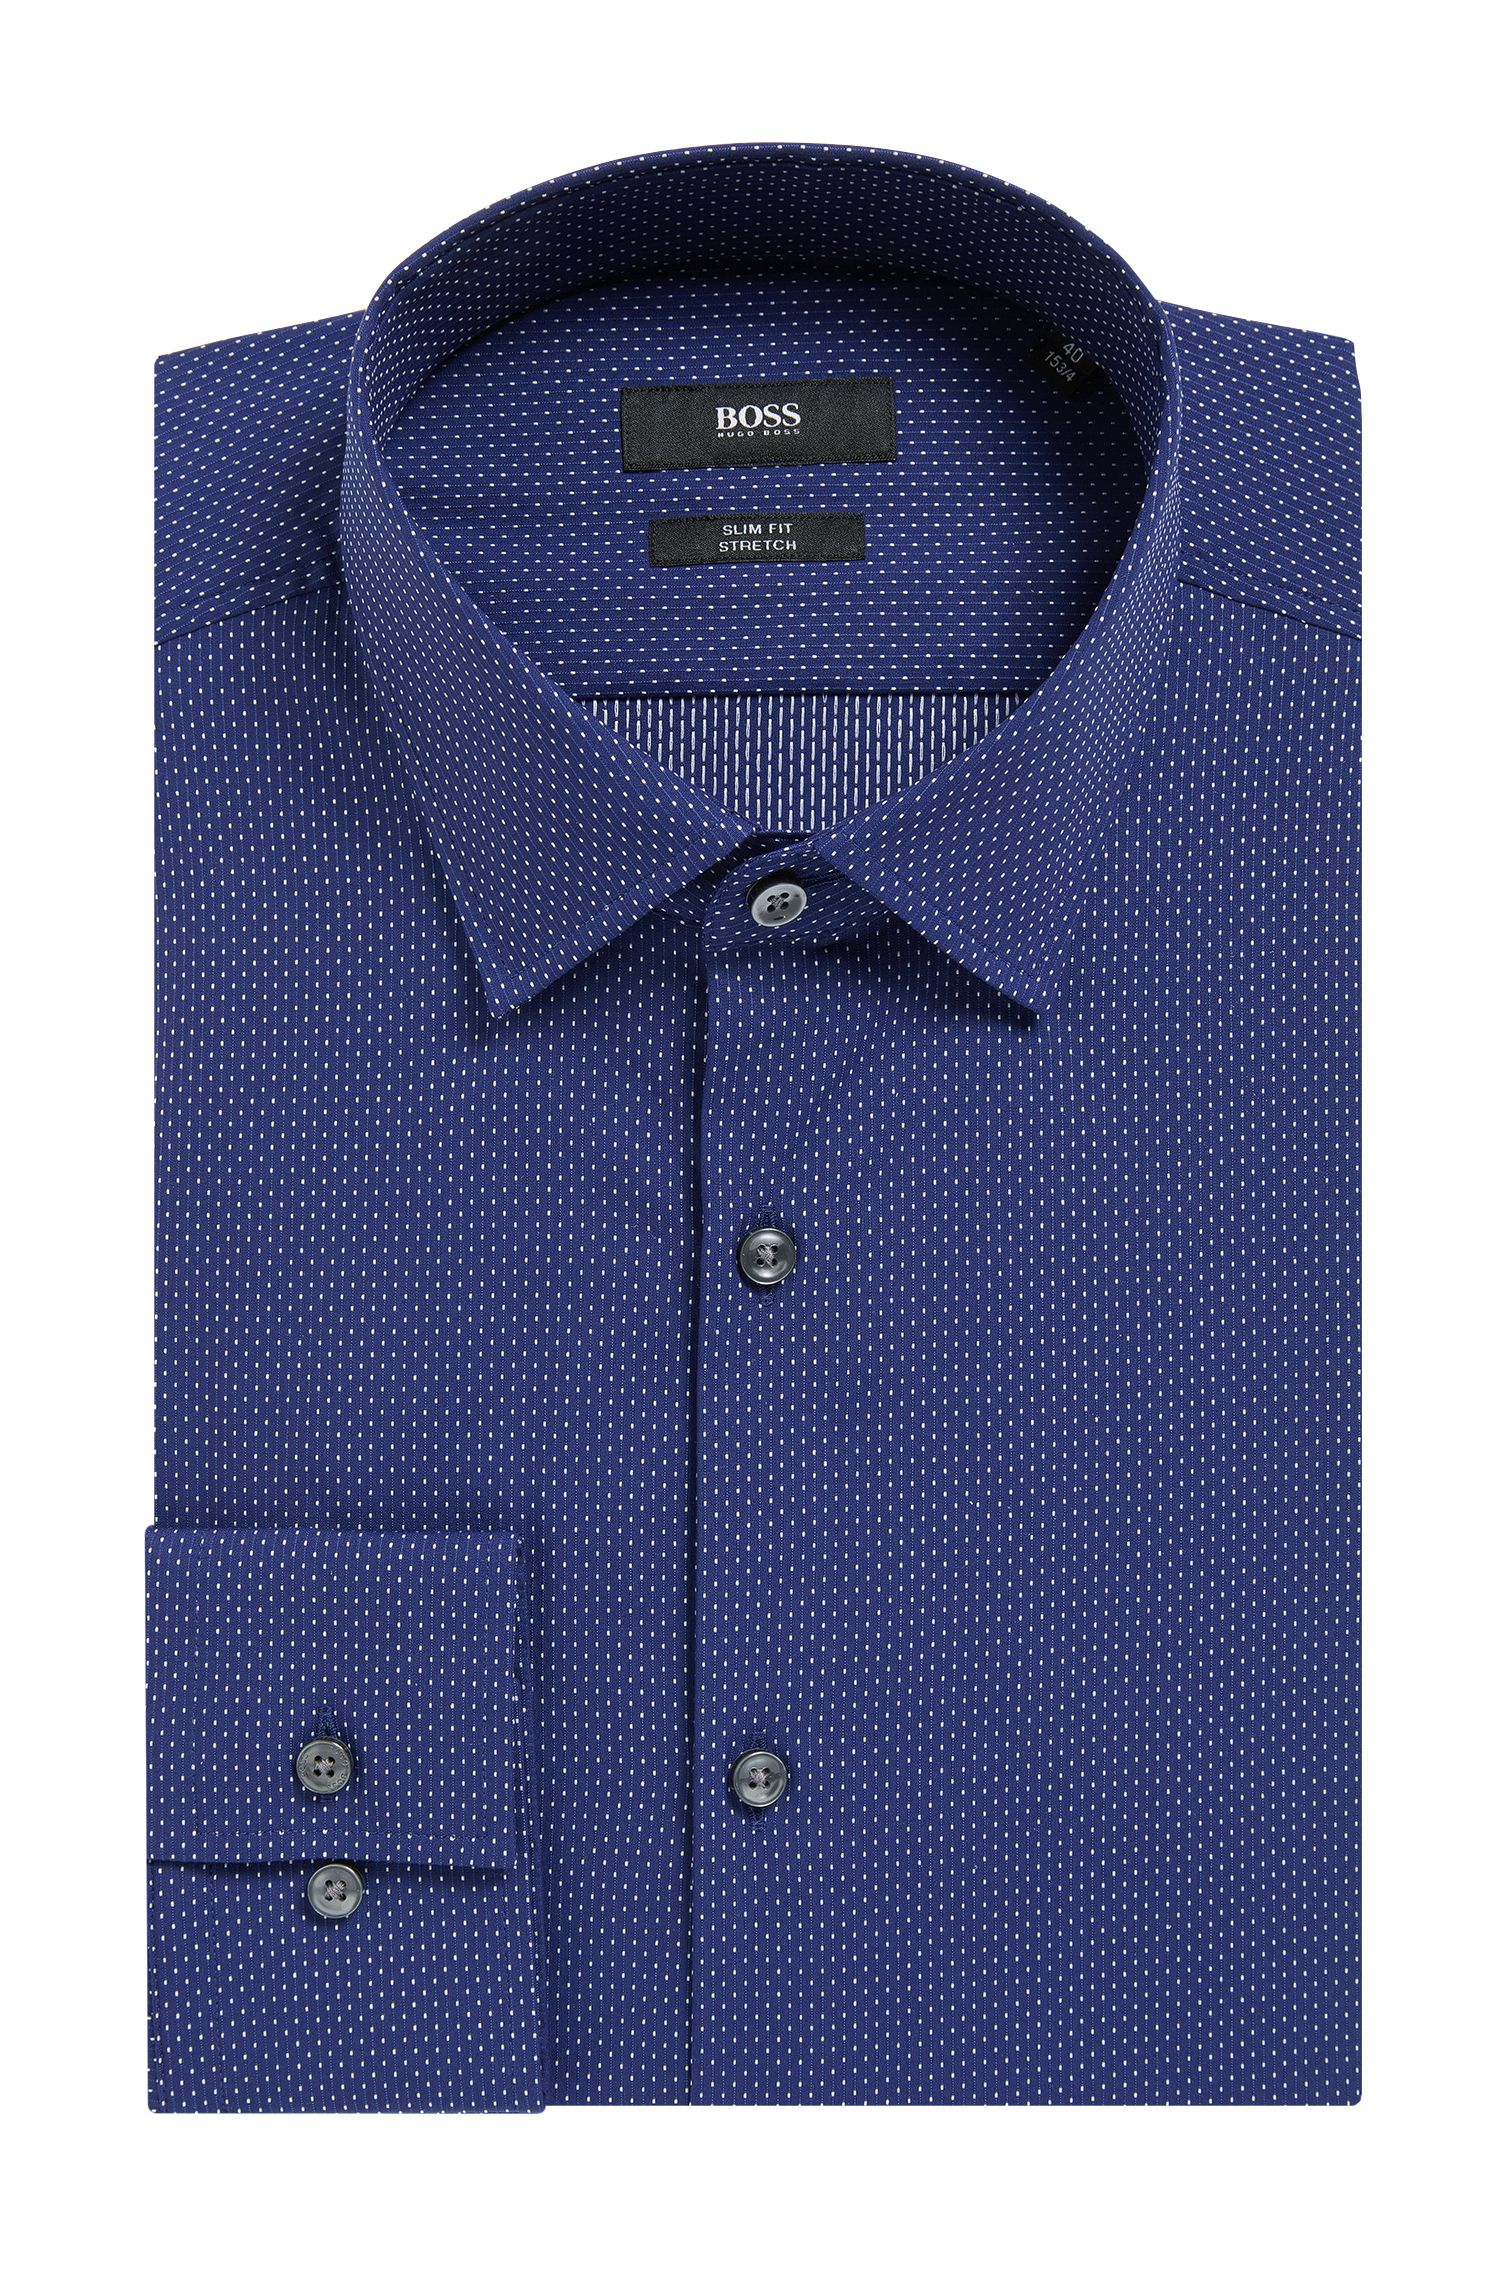 Pindot Stretch Cotton Dress Shirt, Slim Fit | Jenno